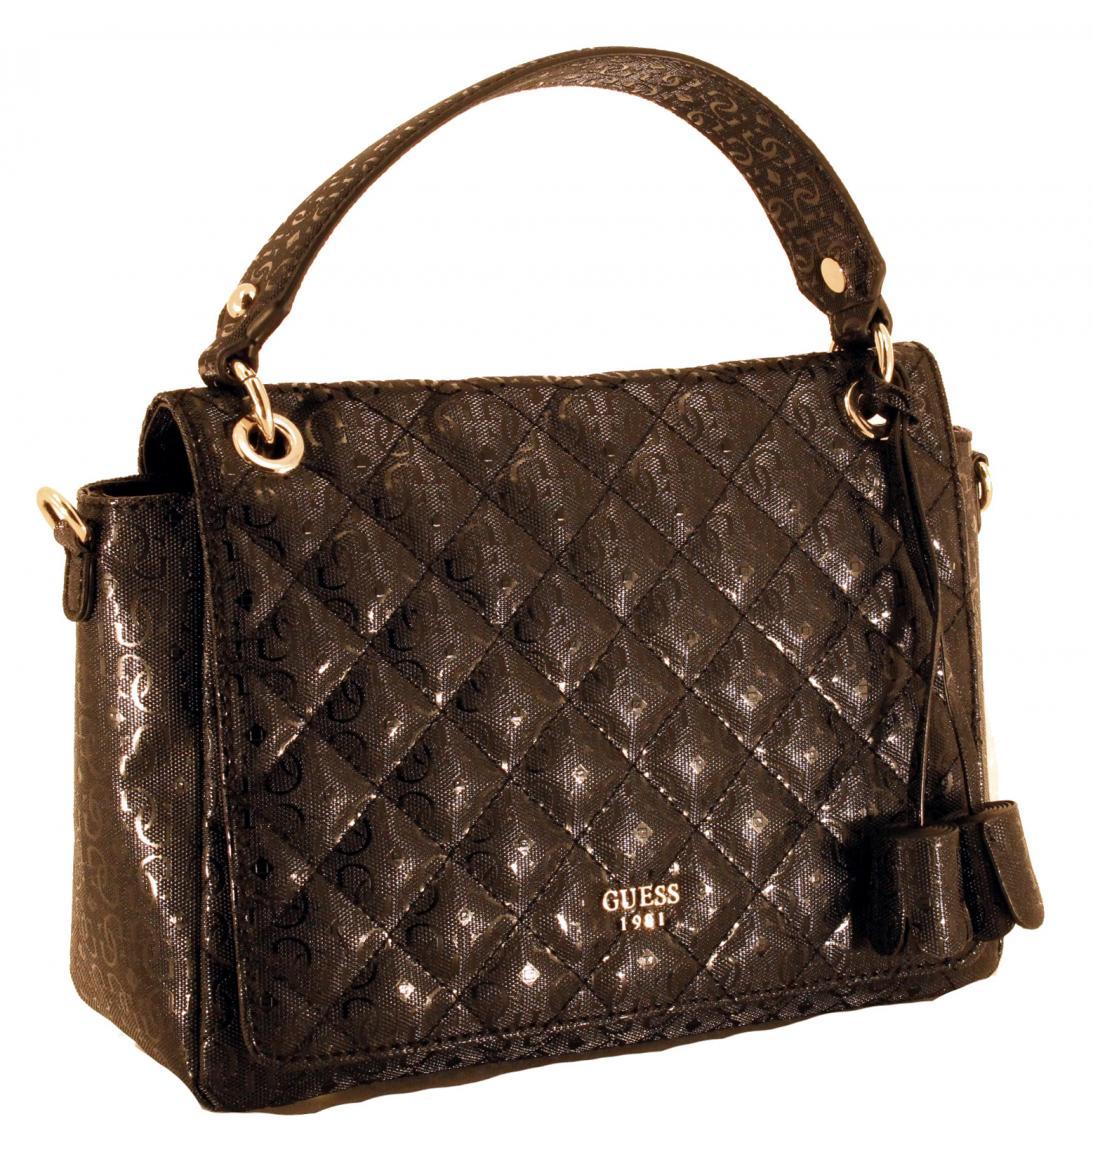 guess handtasche seraphina glanz karo schwarz bags more. Black Bedroom Furniture Sets. Home Design Ideas